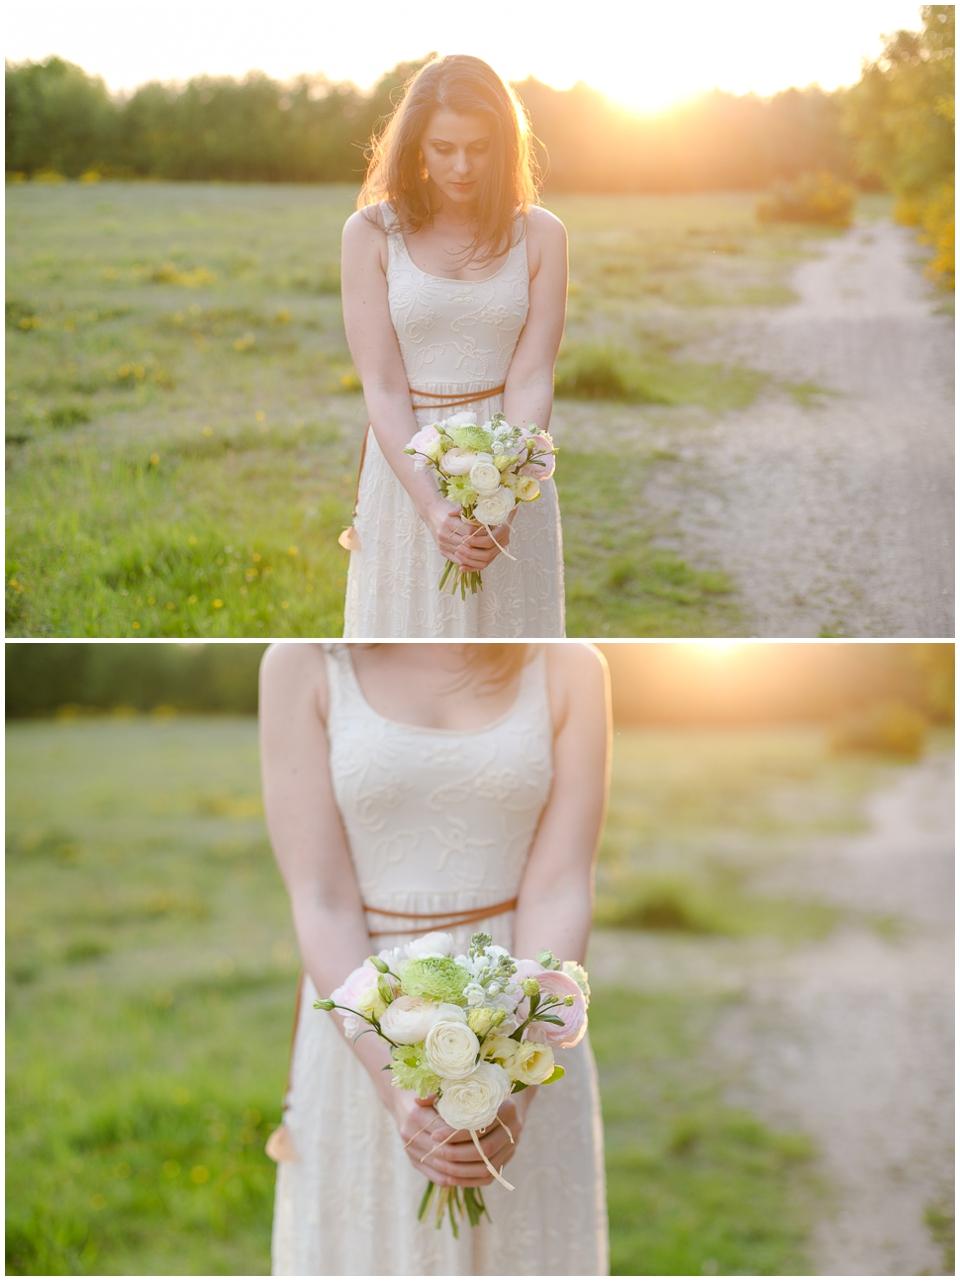 Nicole Wahl Fotografie - Imagefilm_0004